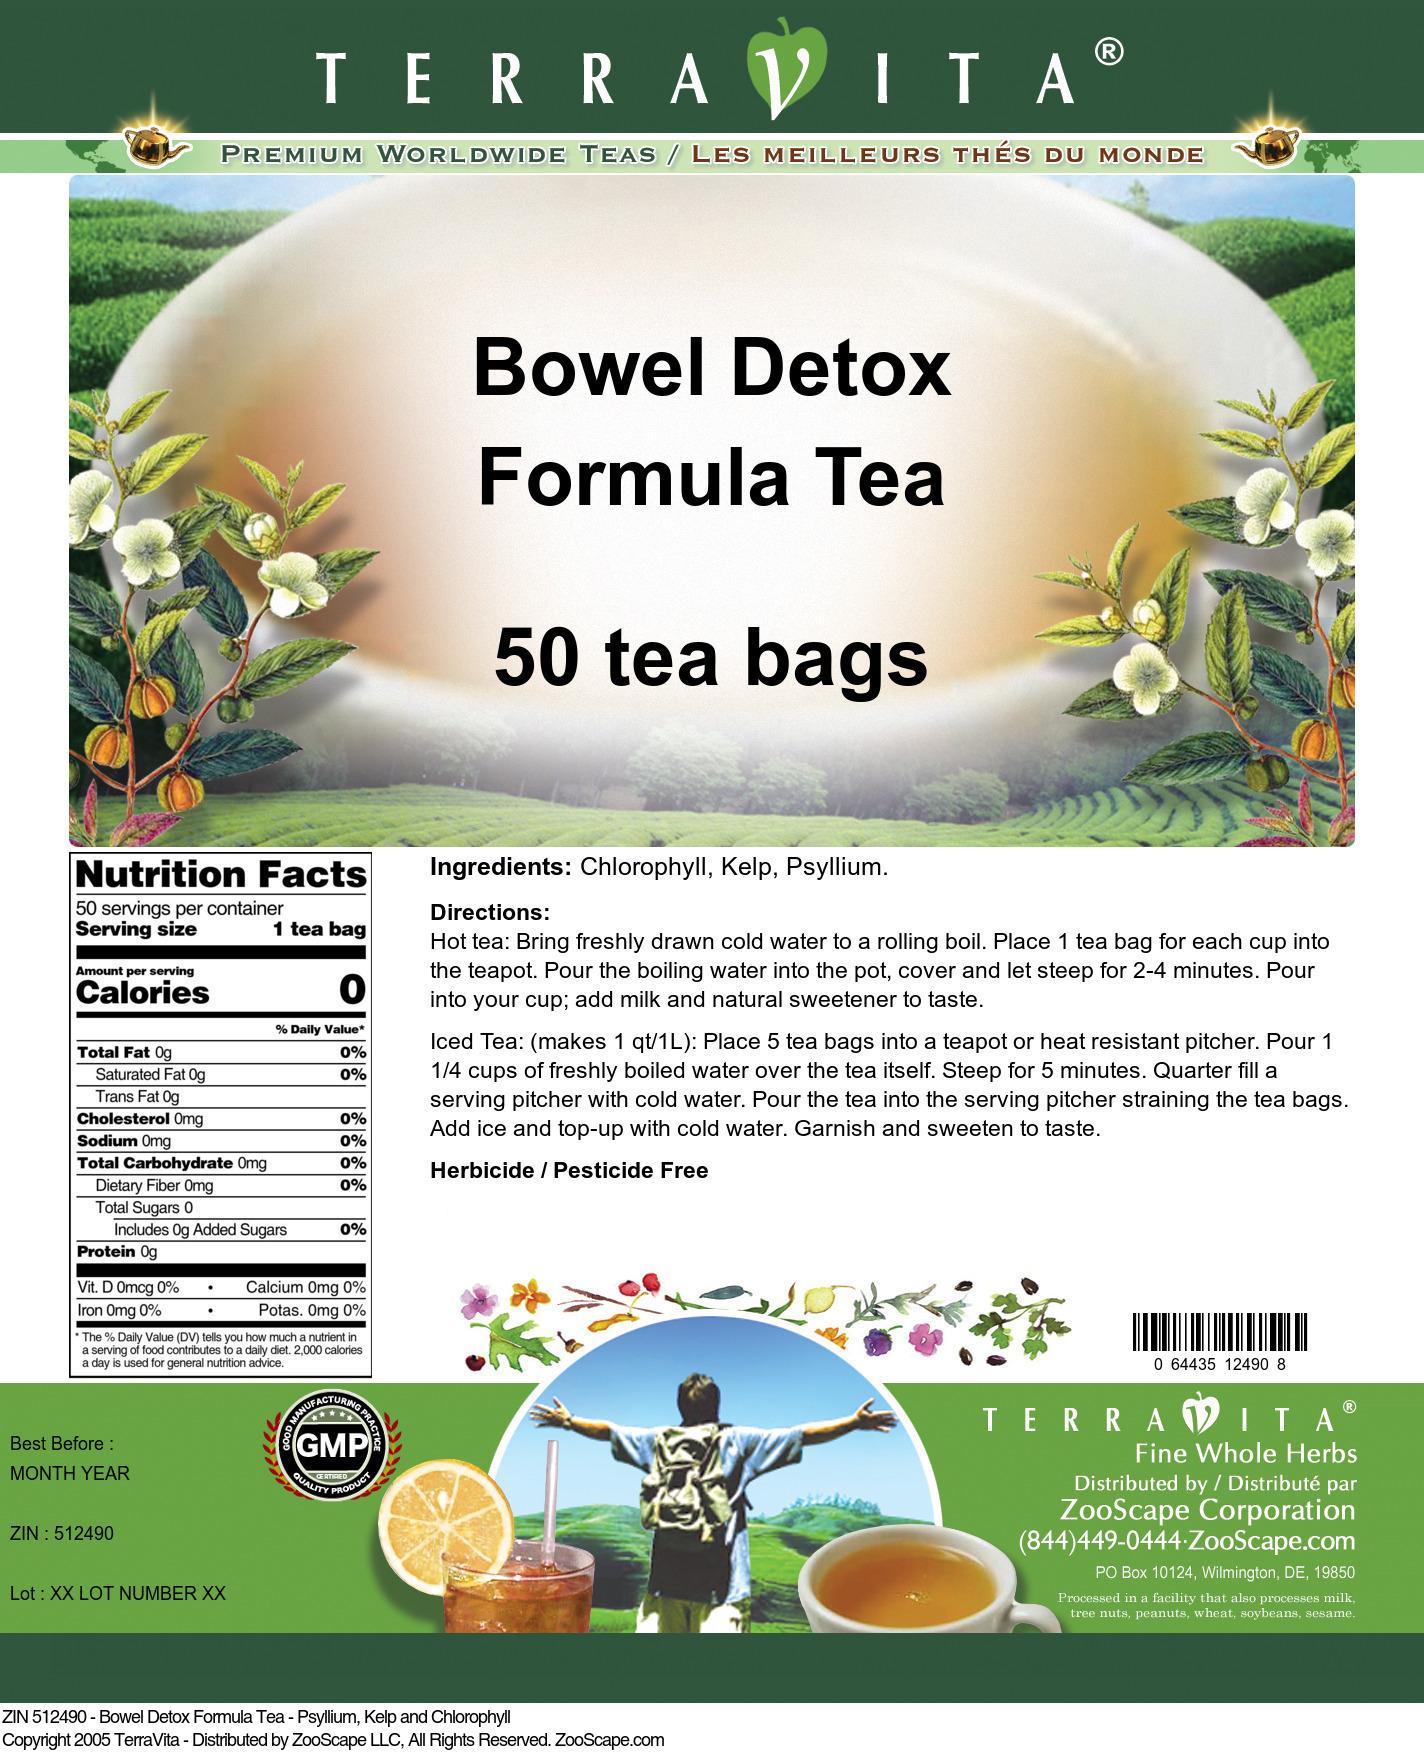 Bowel Detox Formula Tea - Psyllium, Kelp and Chlorophyll